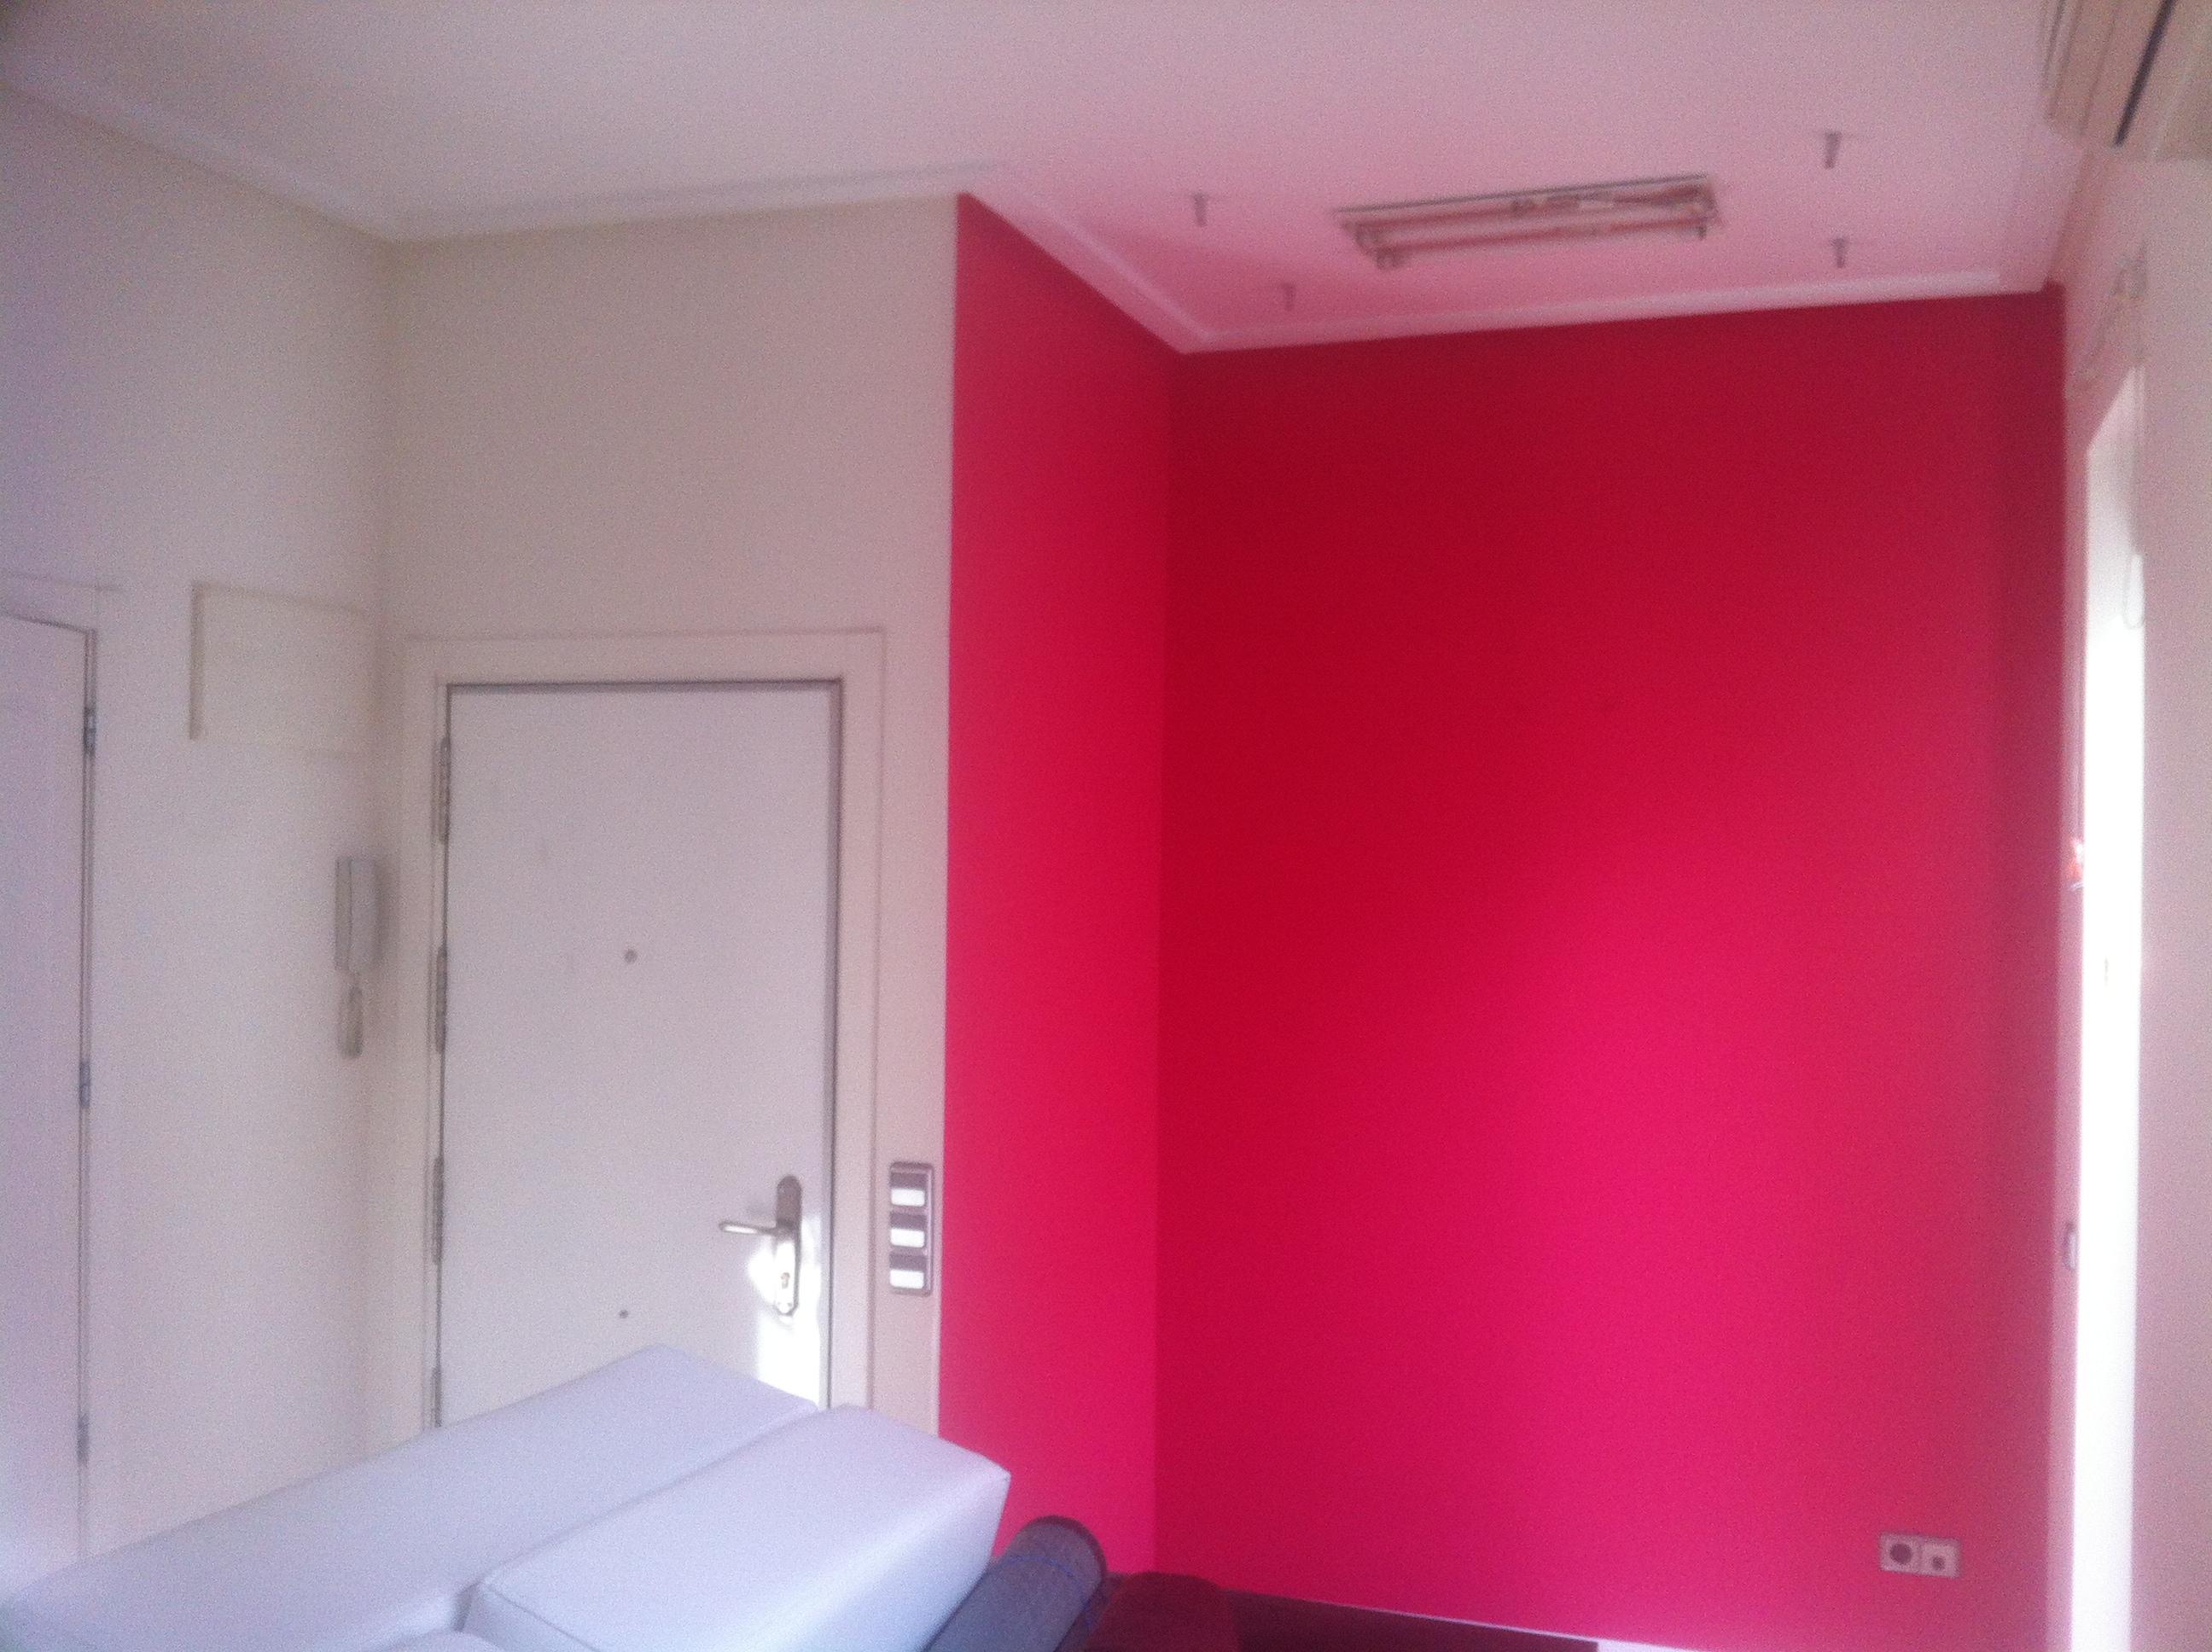 Esmalte al Agua Color Rosa Frambueja  PINTORES EN MADRID  PINTOR EN MADRID  PINTORES MADRID